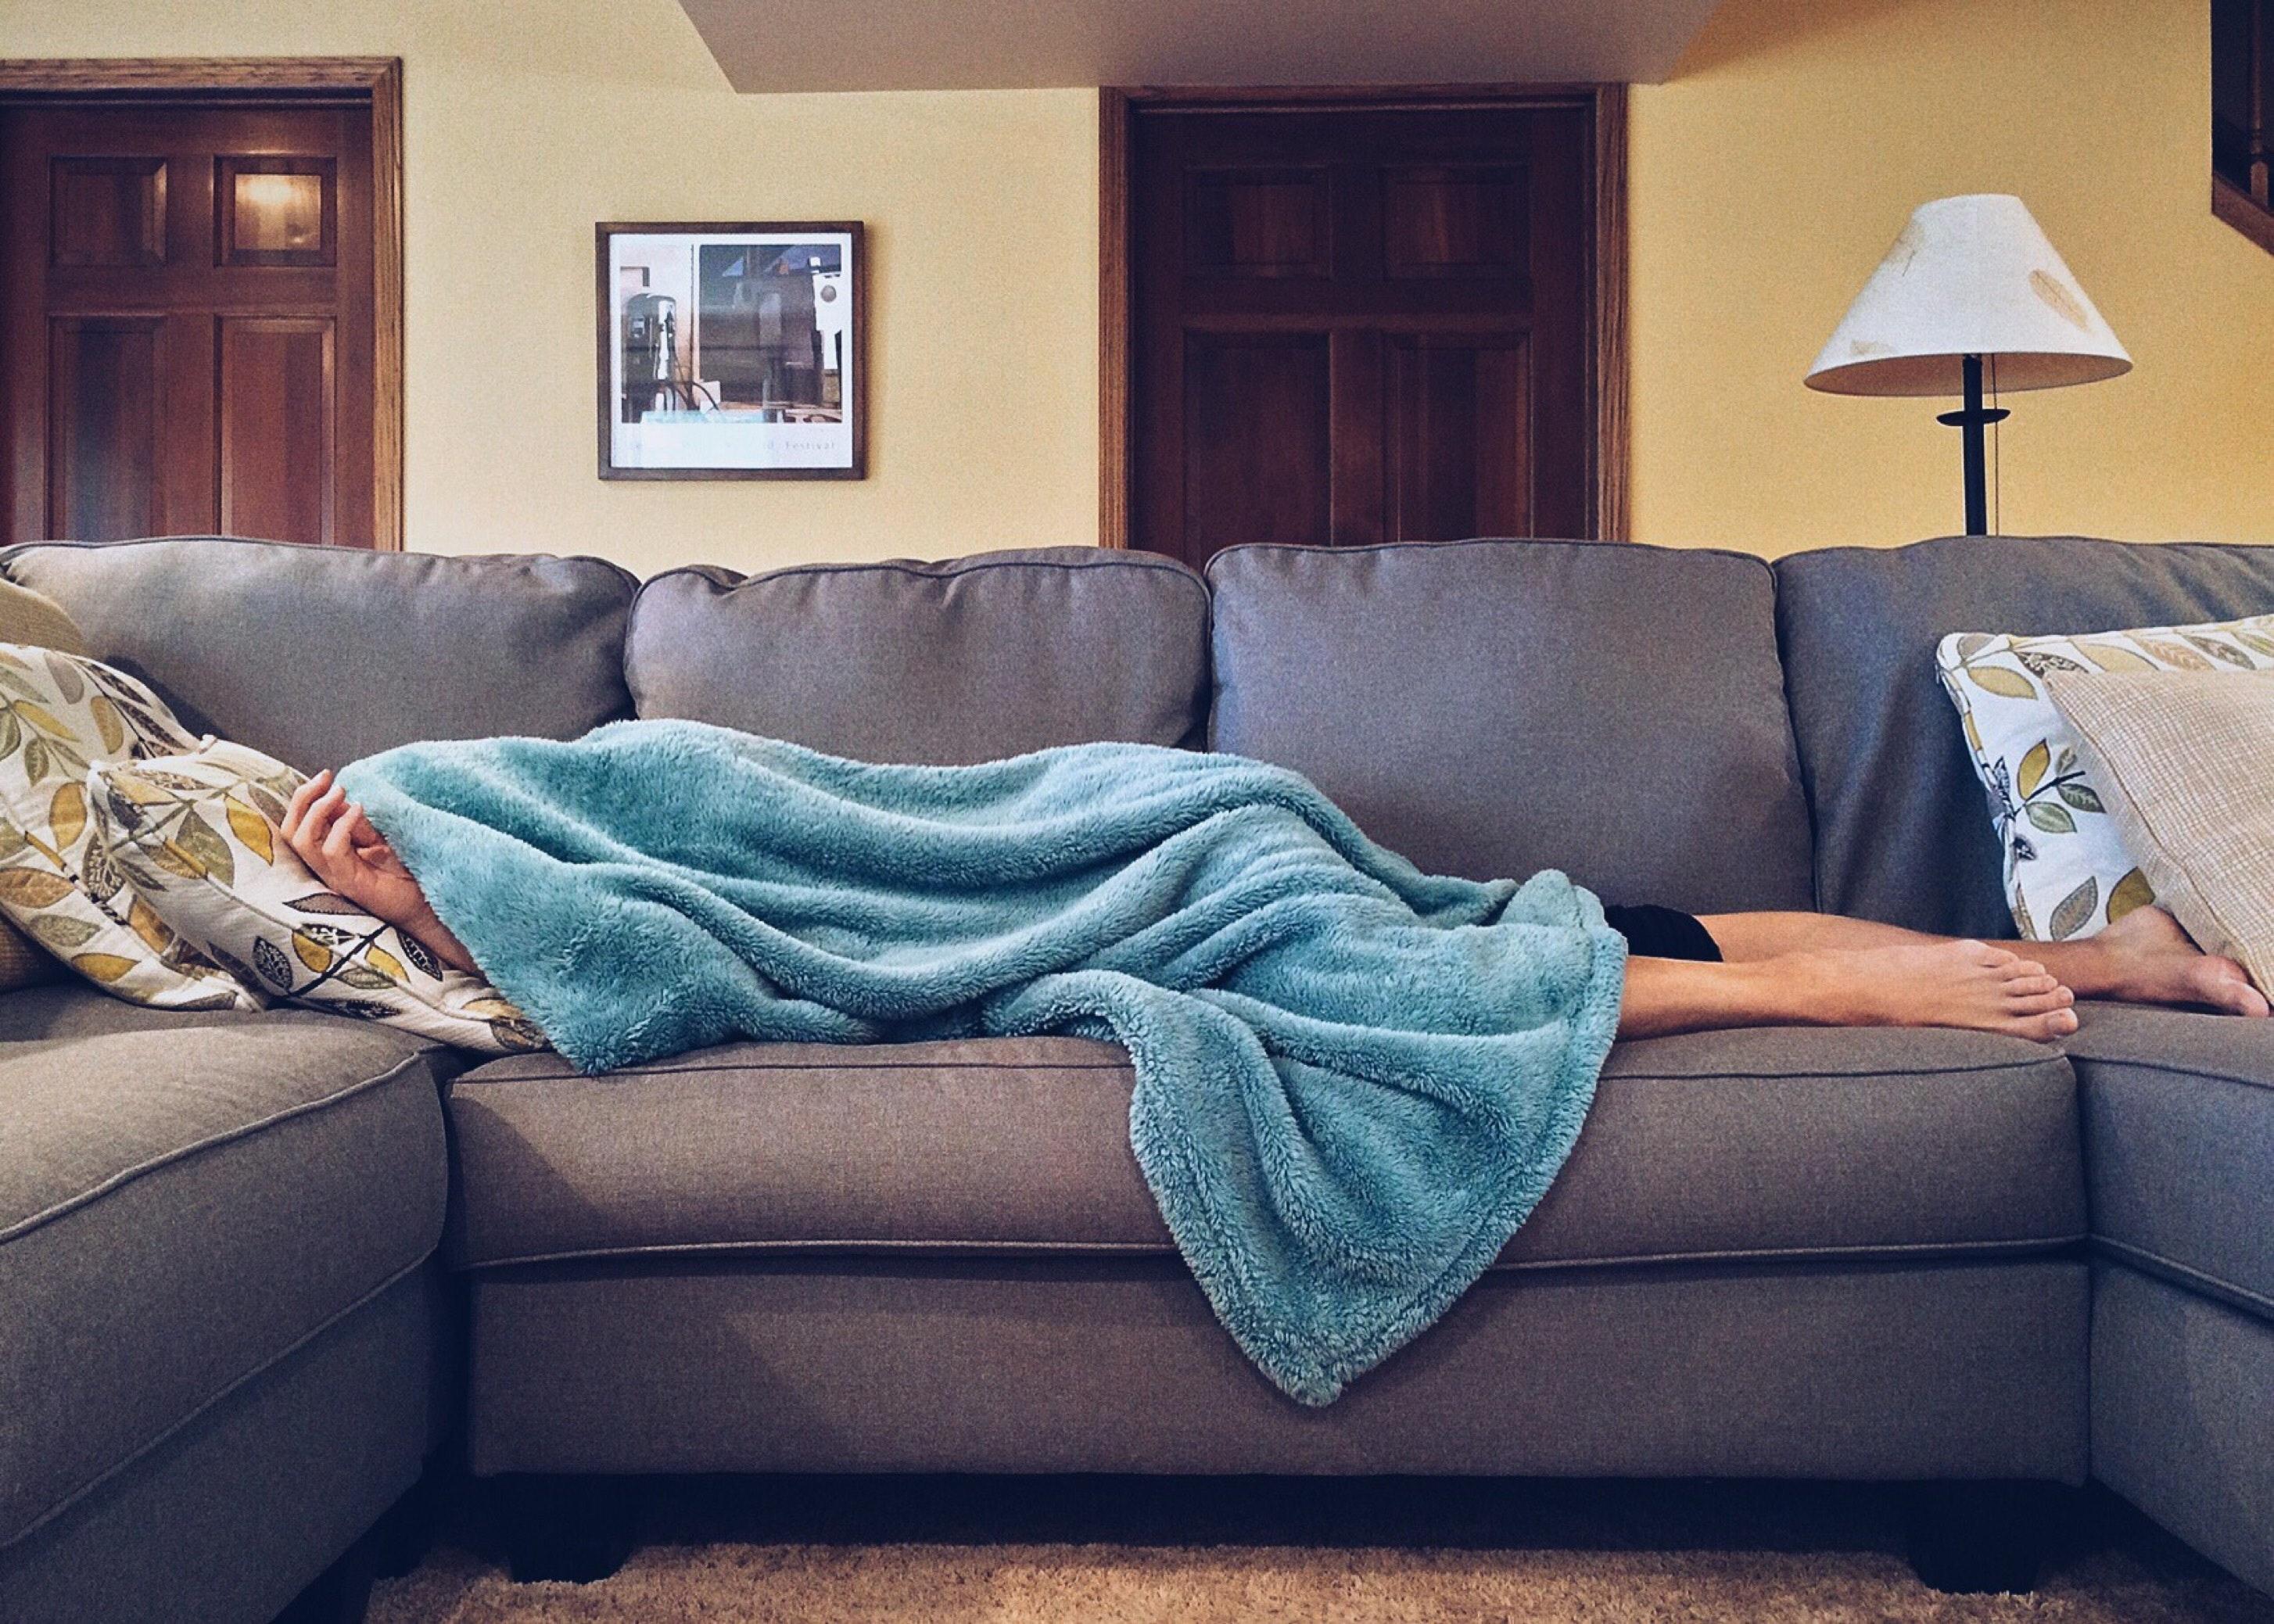 Joyfully Surviving: Living With Illness